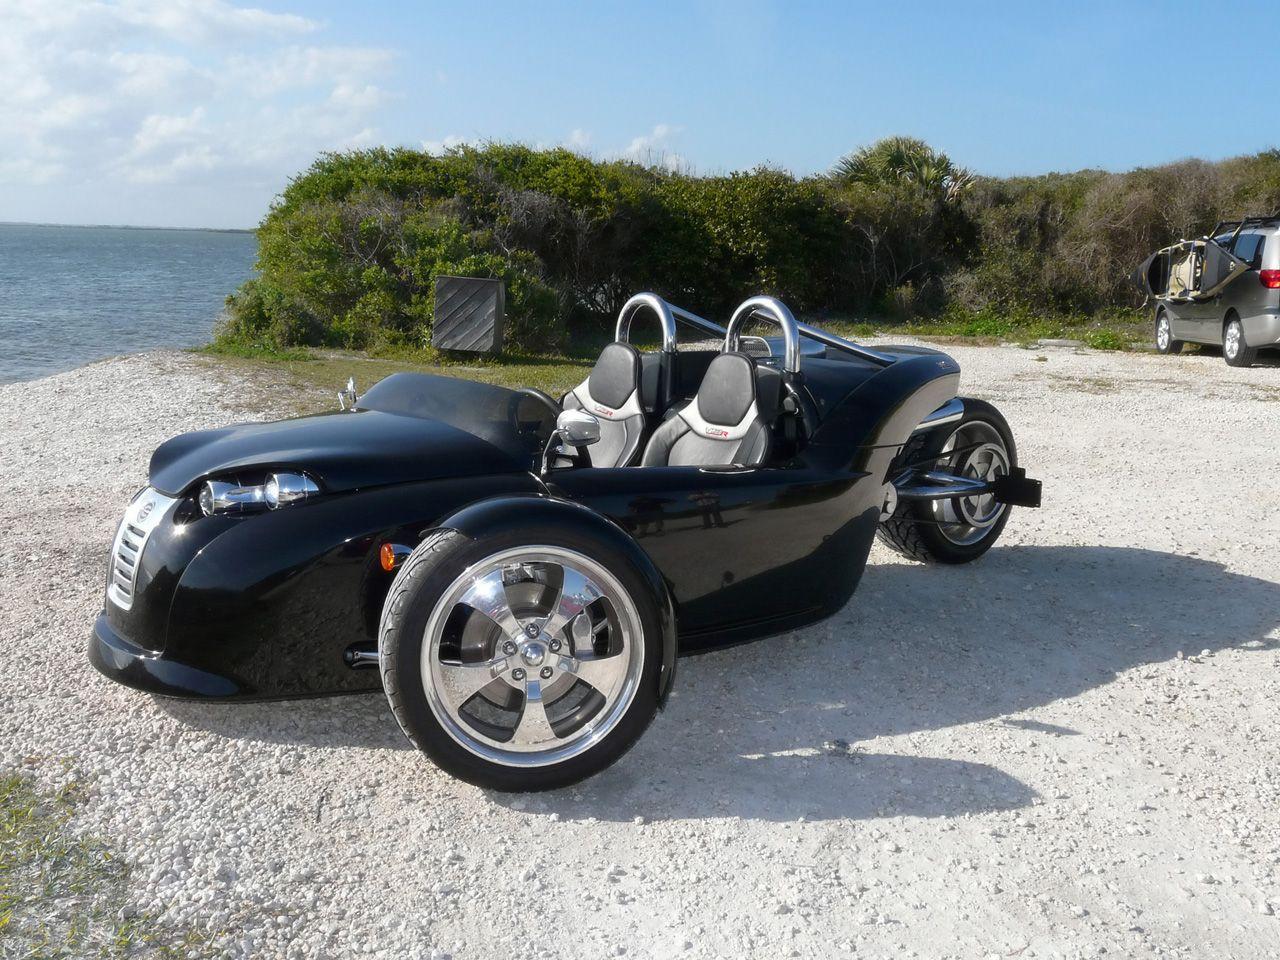 T-Rex Motorcycle for Sale | Campagna Motors: V13R or T-Rex